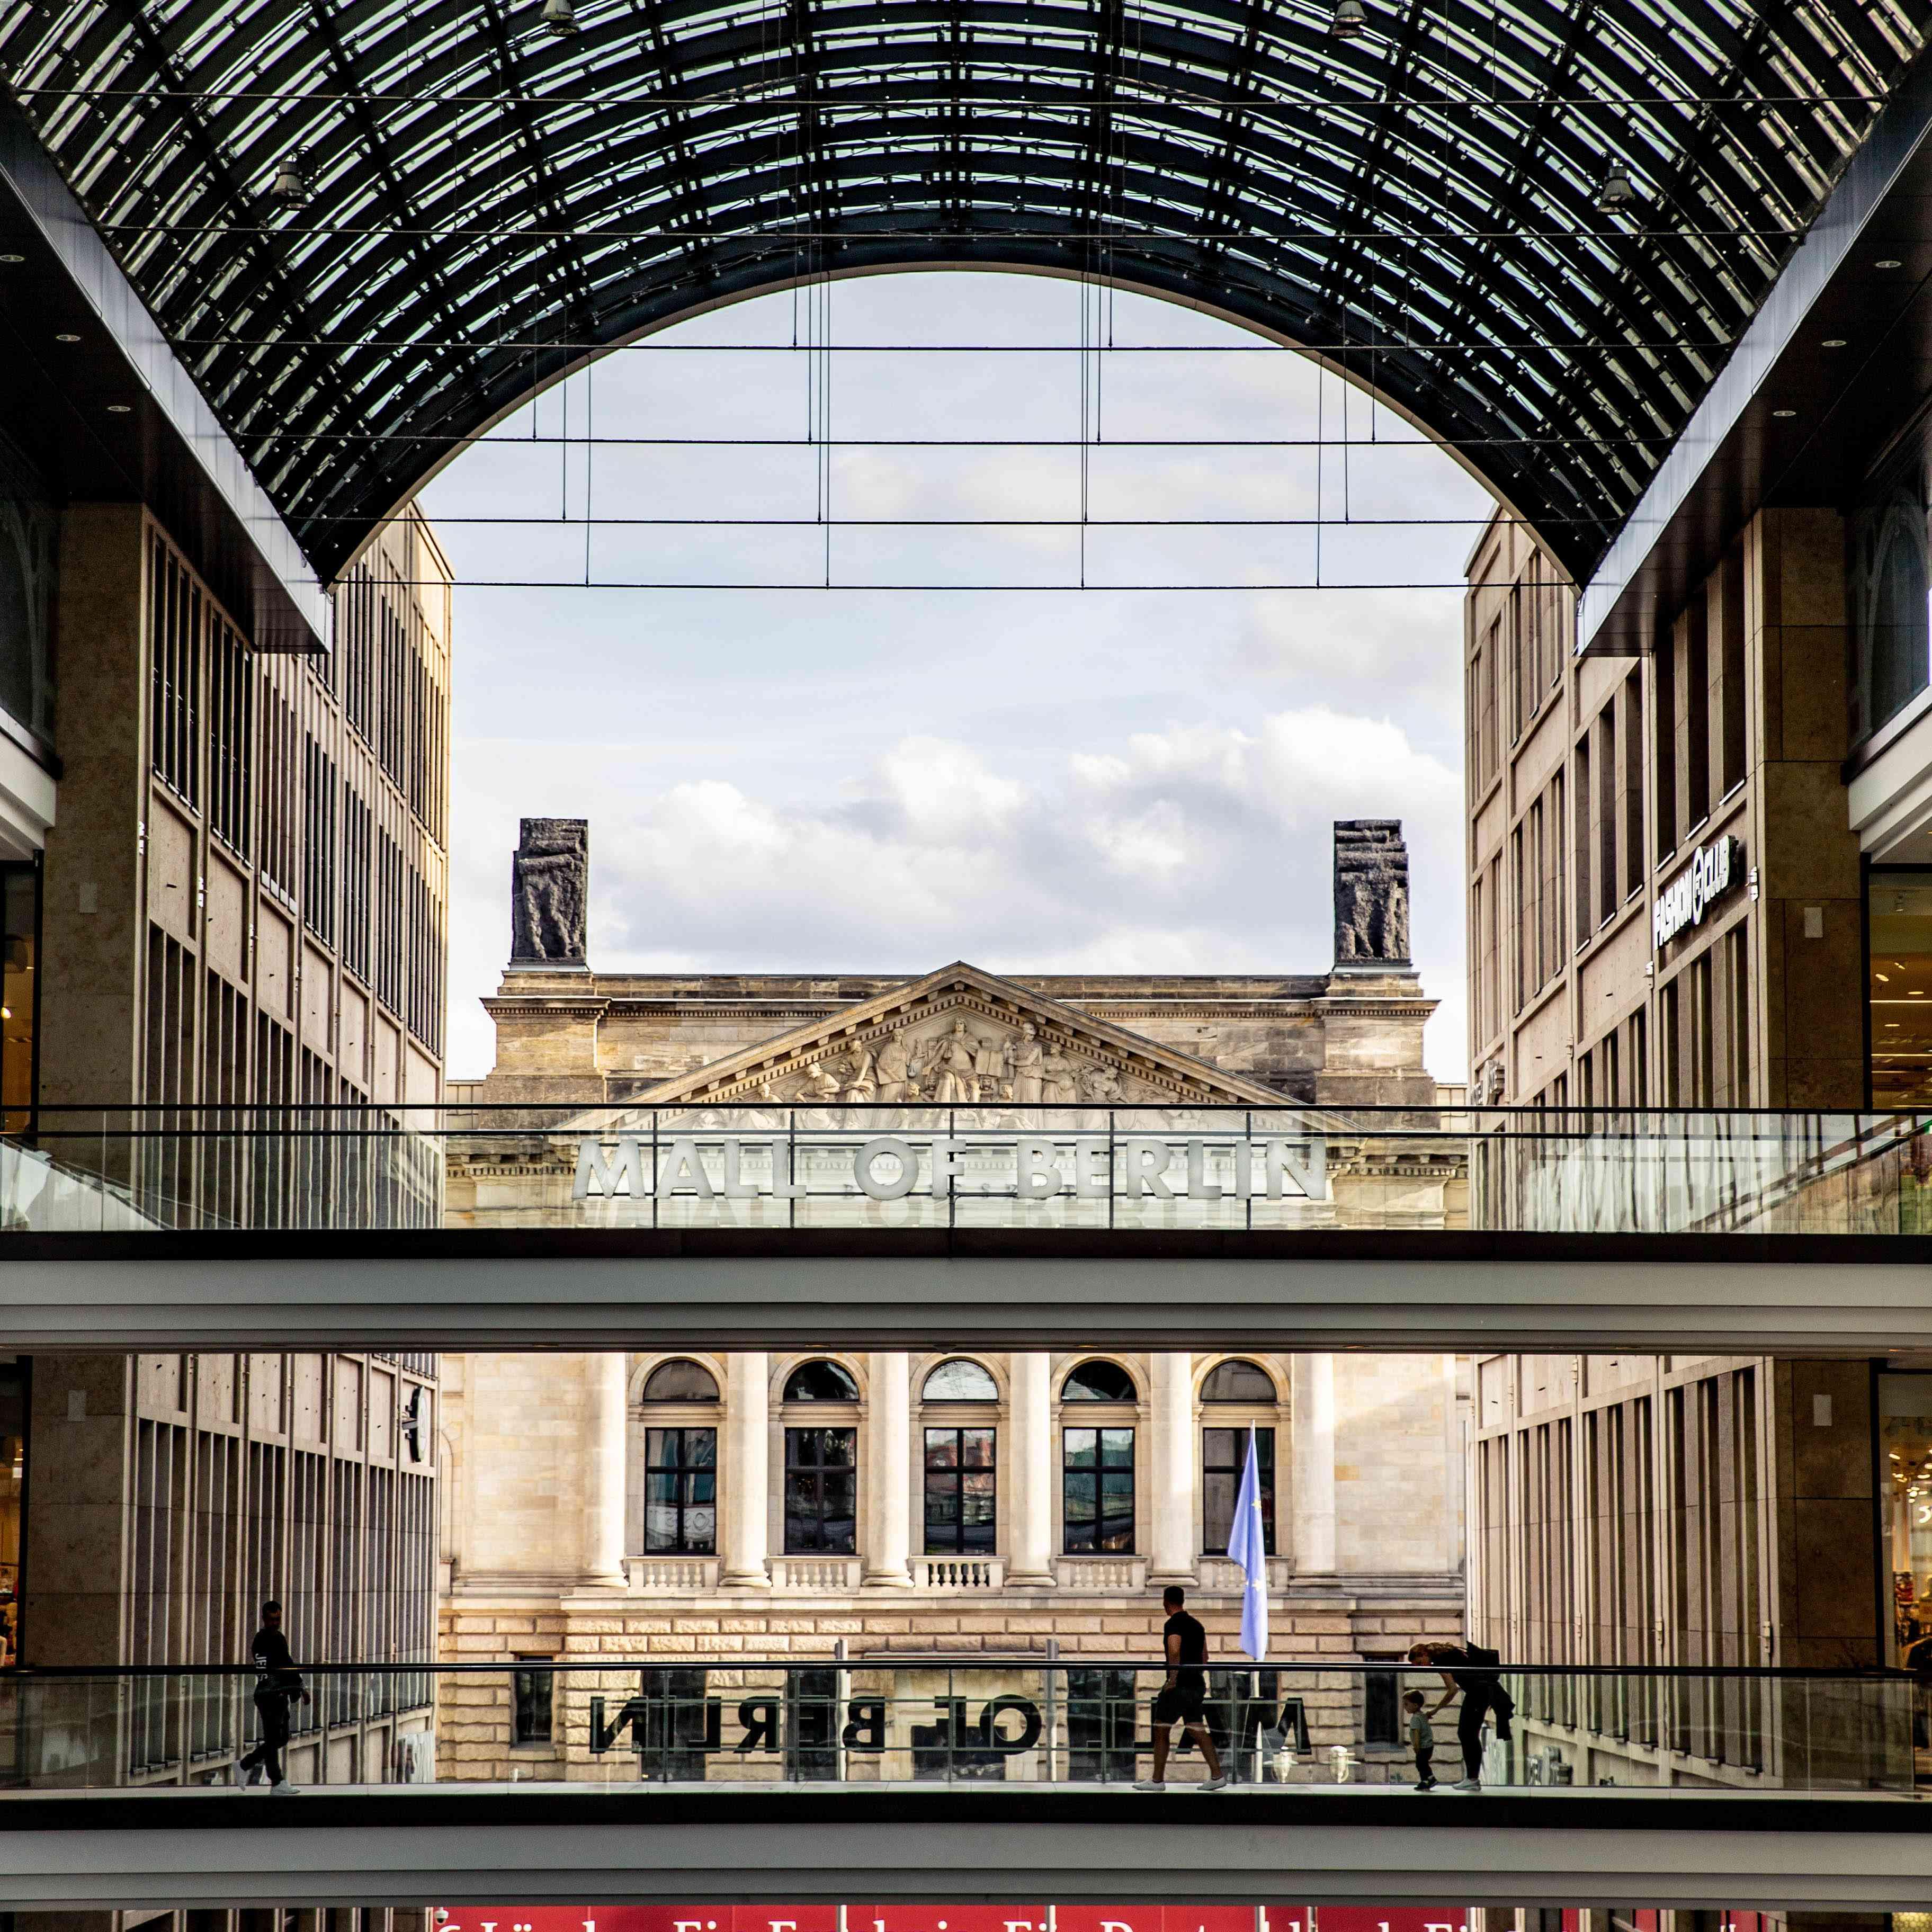 A shopping mall in Potsdamer Platz